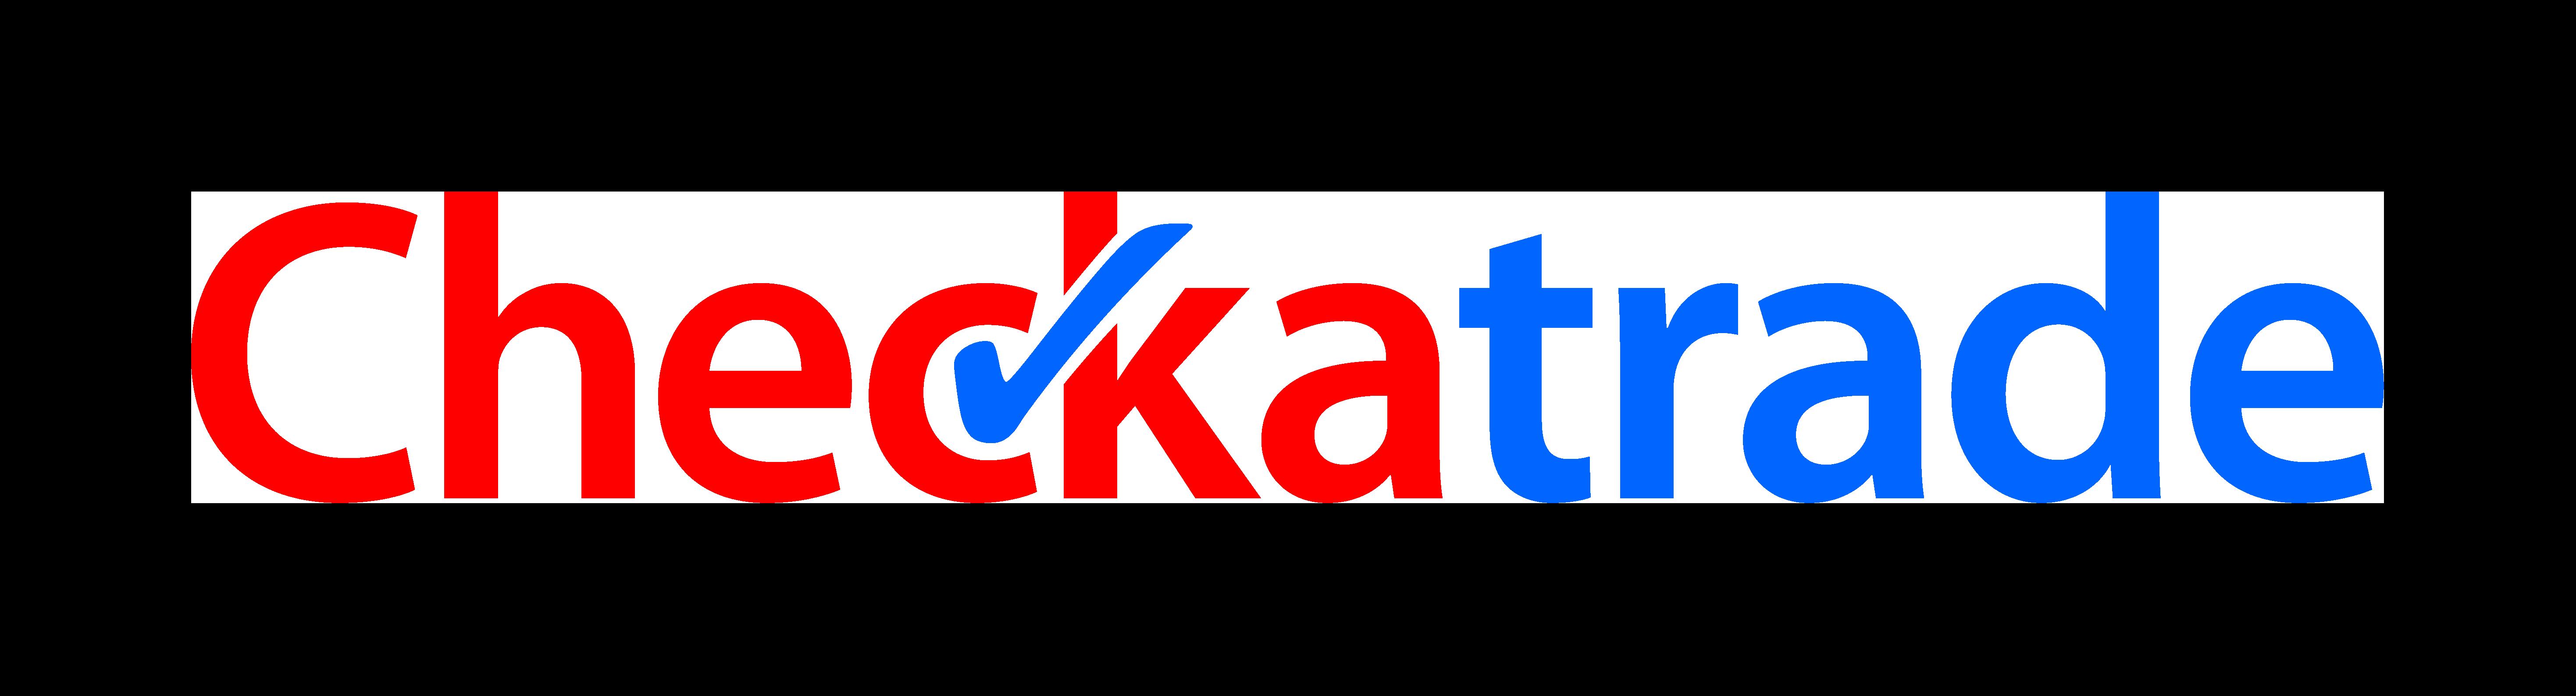 Image result for checkatrade